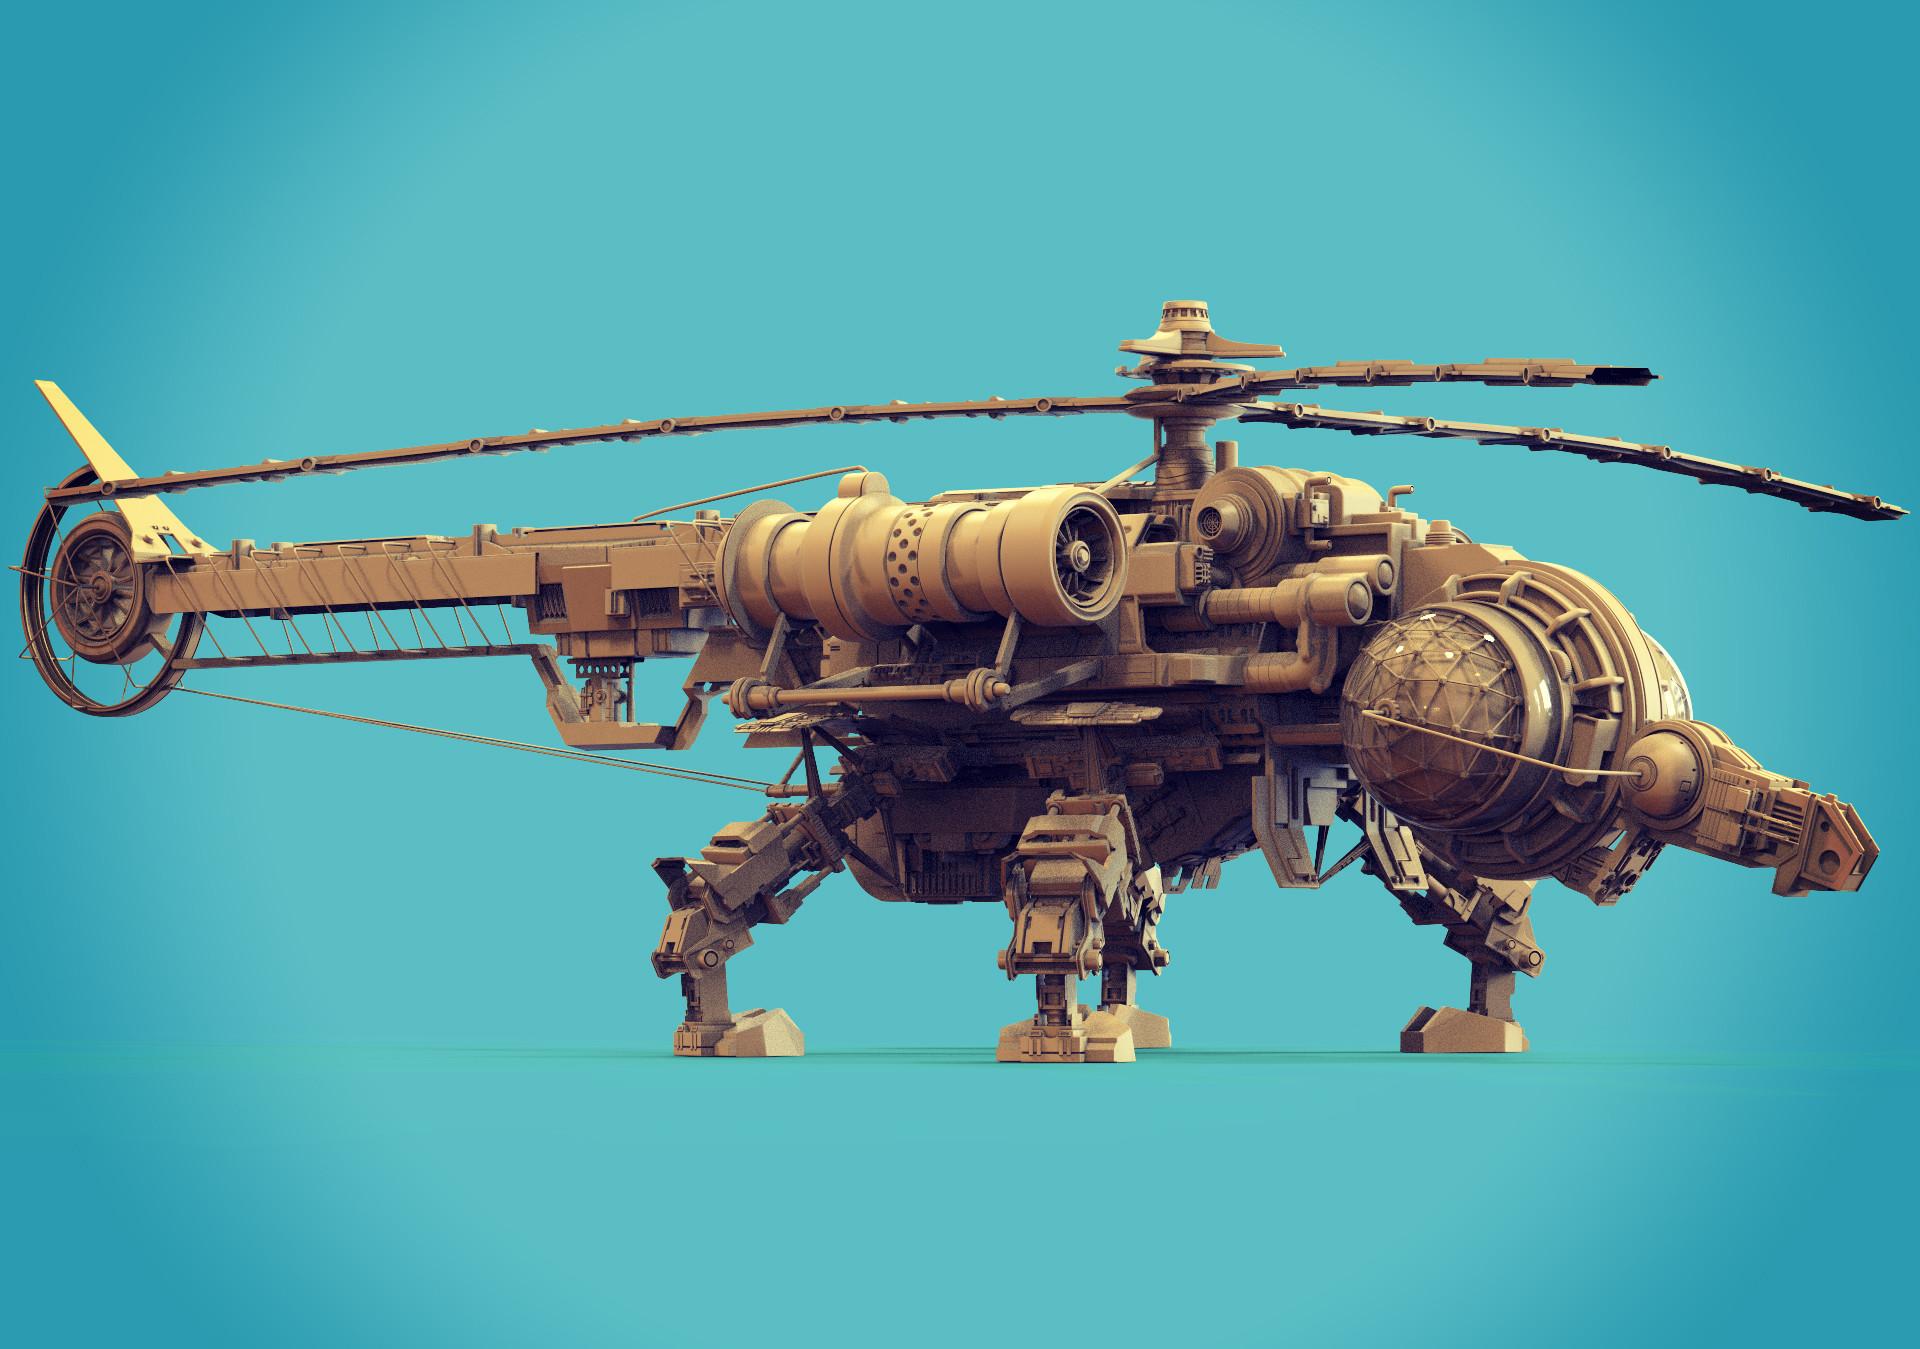 Ben nicholas bughelicopter 02